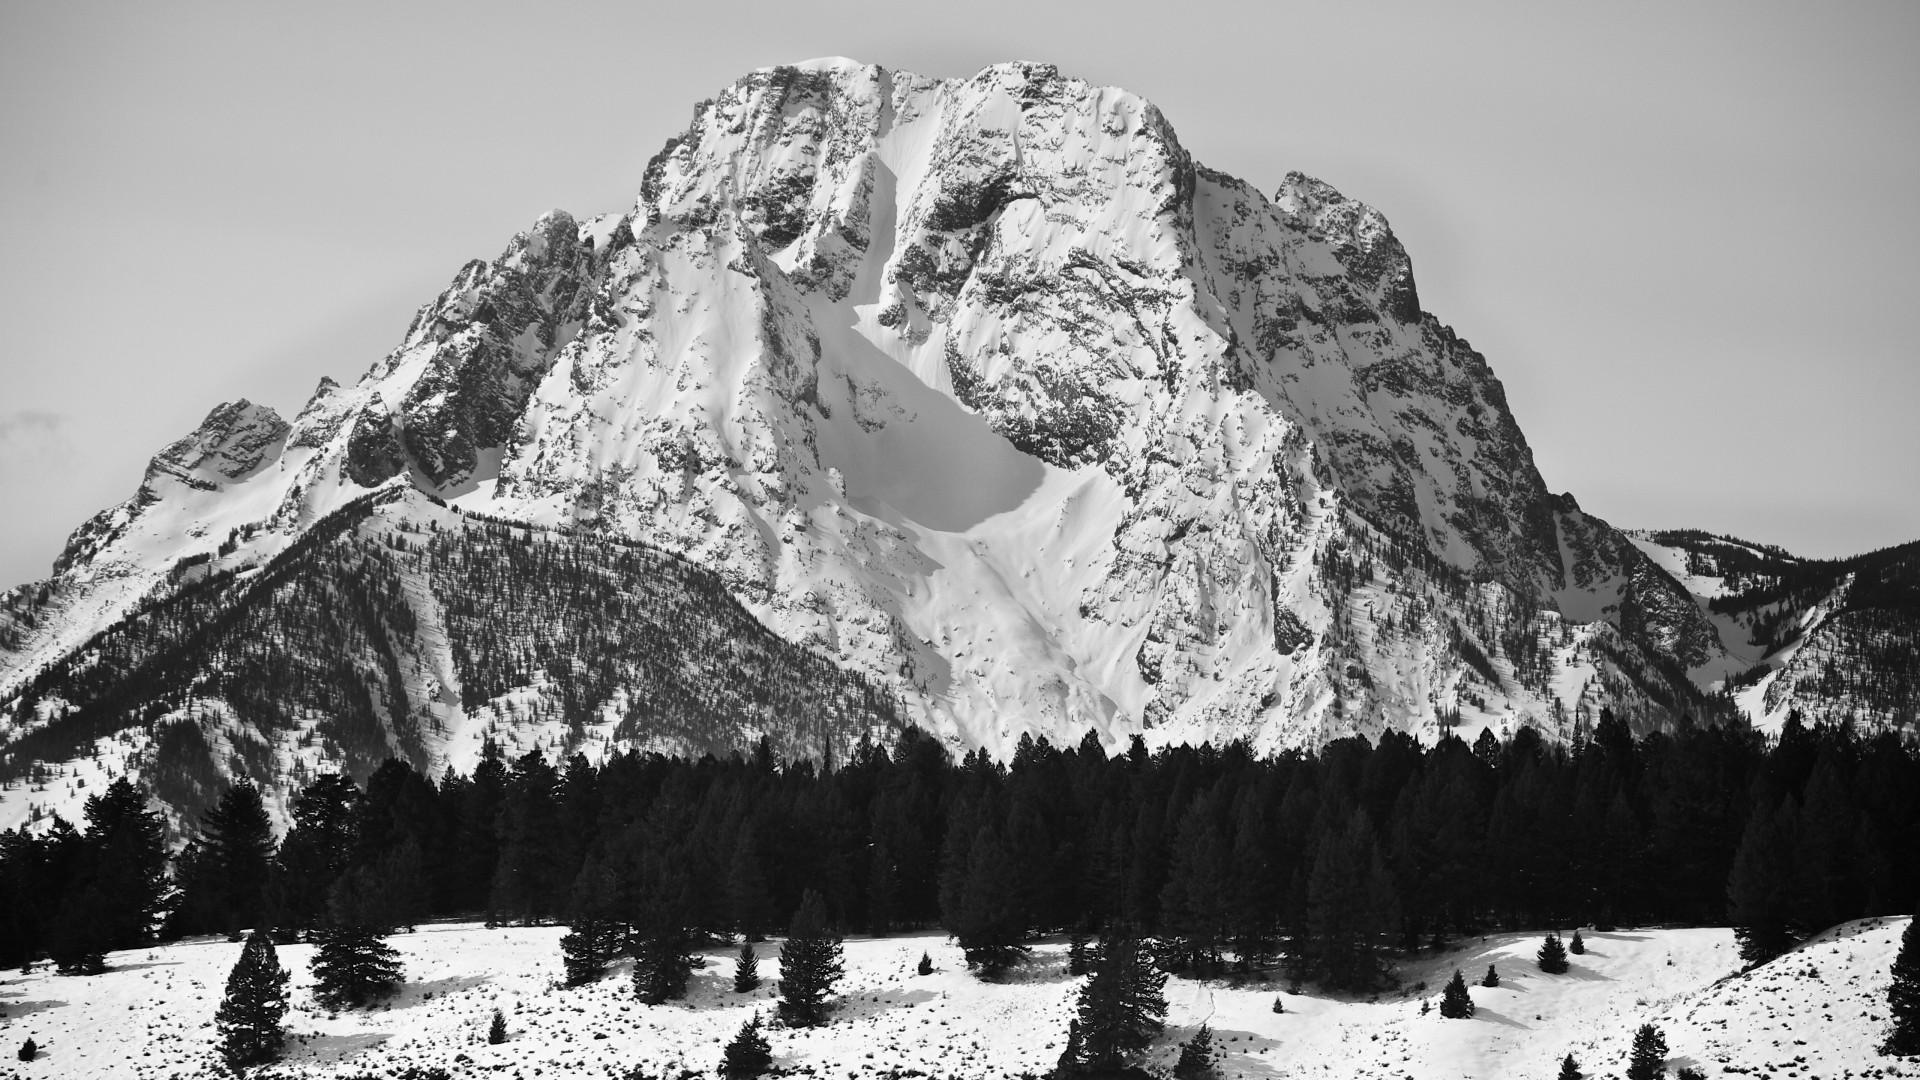 Motor Village La >> Wallpaper Mount Moran, 5k, 4k wallpaper, USA, Mountains ...